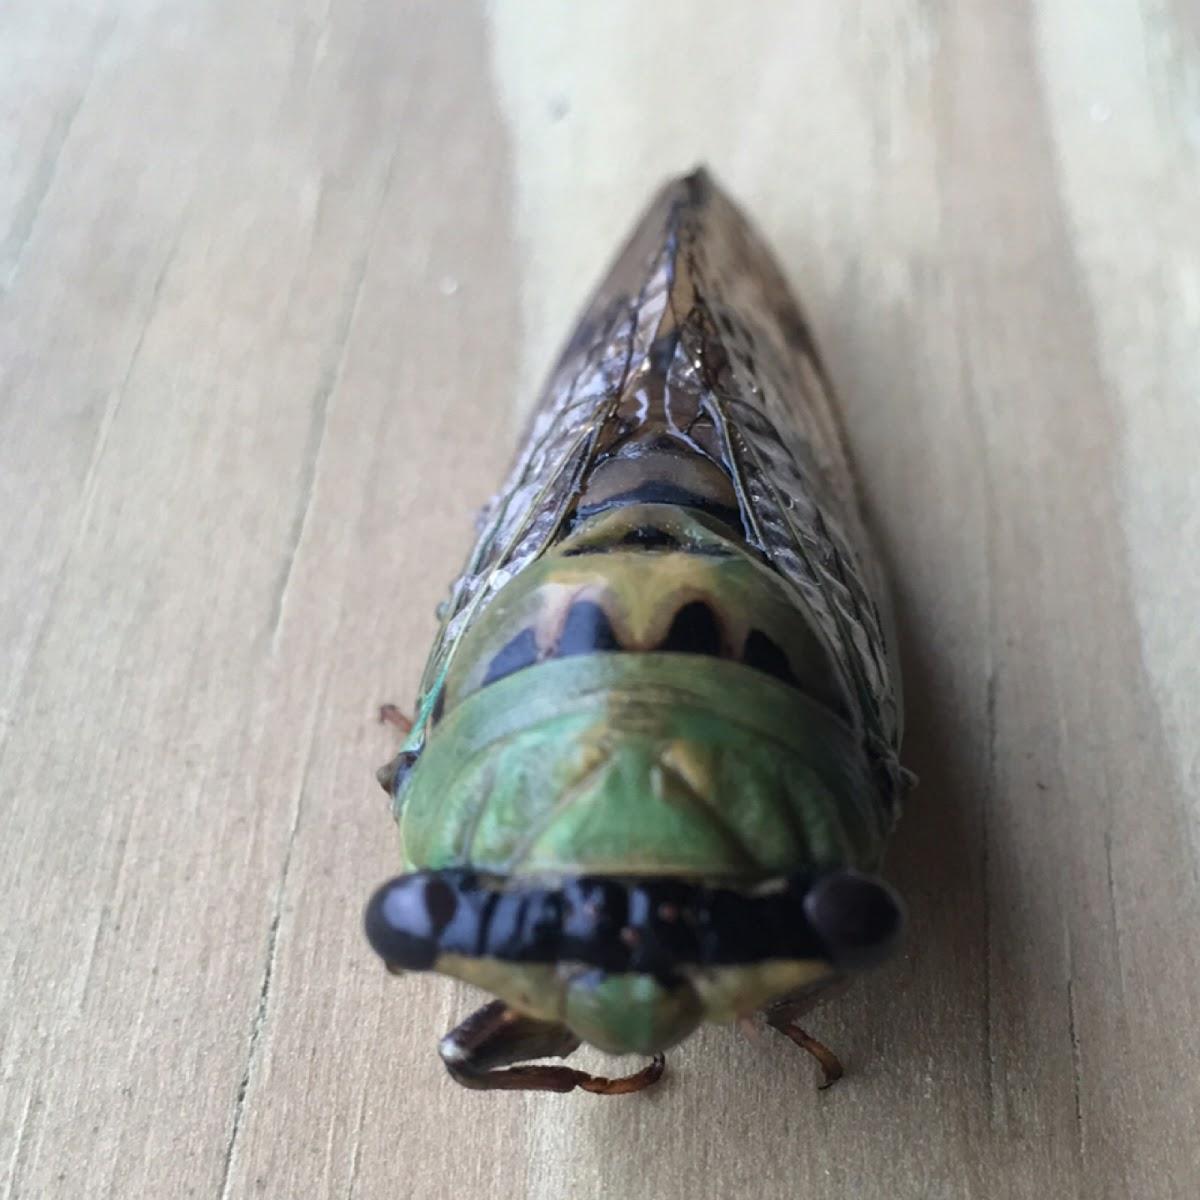 Cicadas, dog day cicada, dog day harvest fly